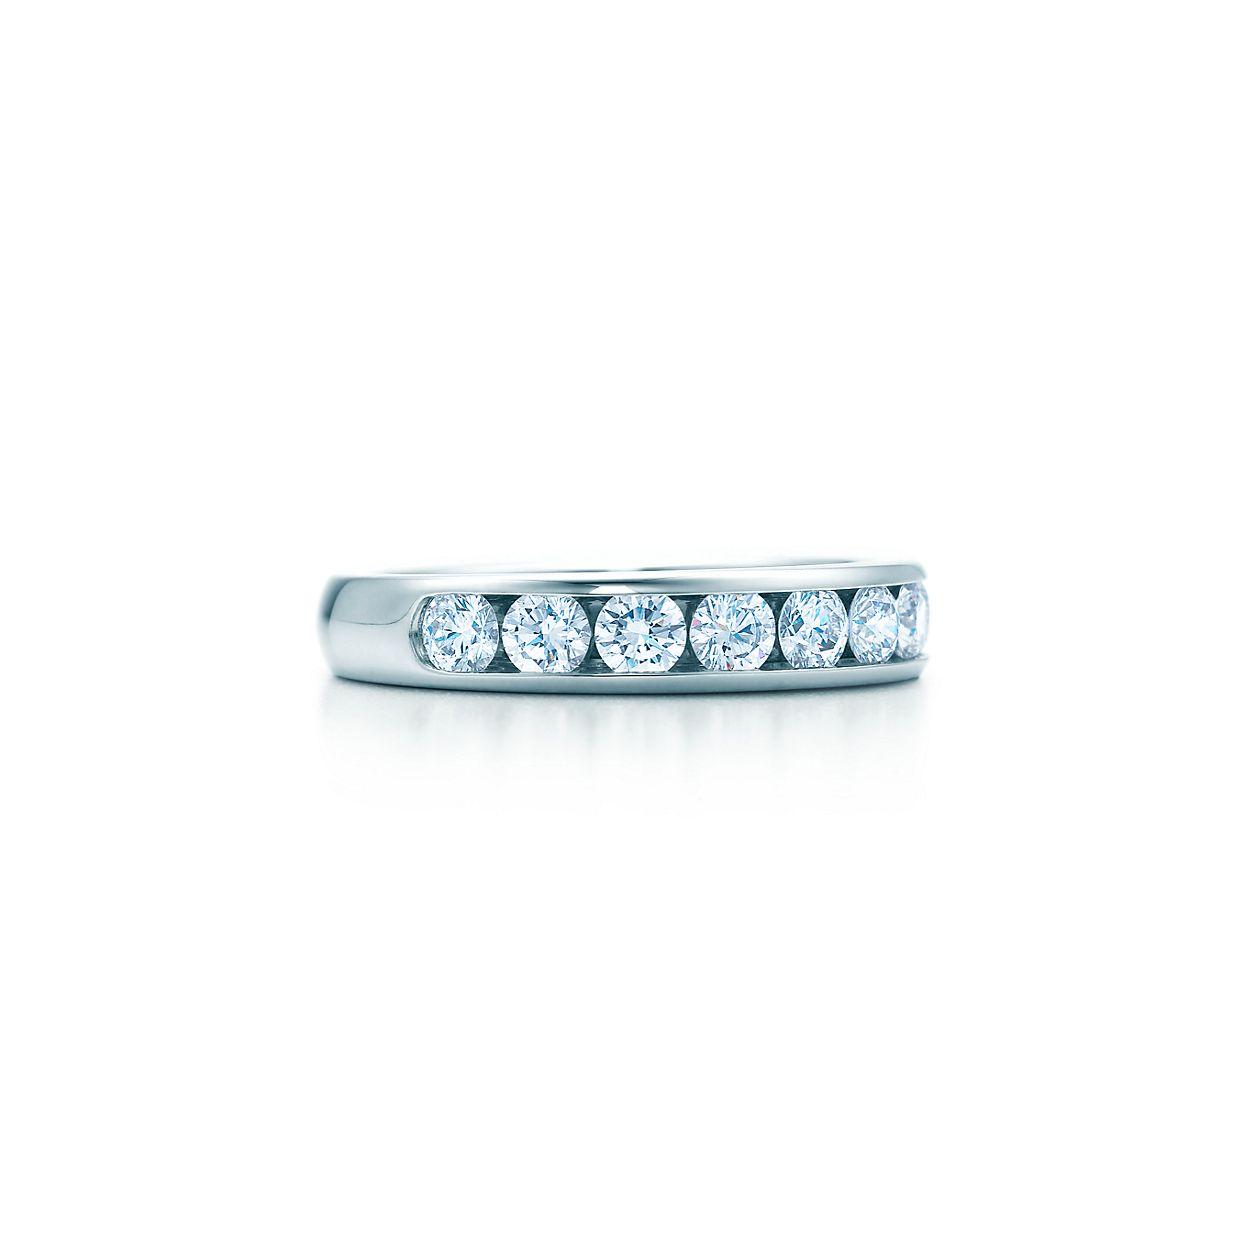 Tiffany diamond wedding band in platinum 39 mm wide tiffany tiffany diamond wedding band tiffany diamond wedding band junglespirit Images